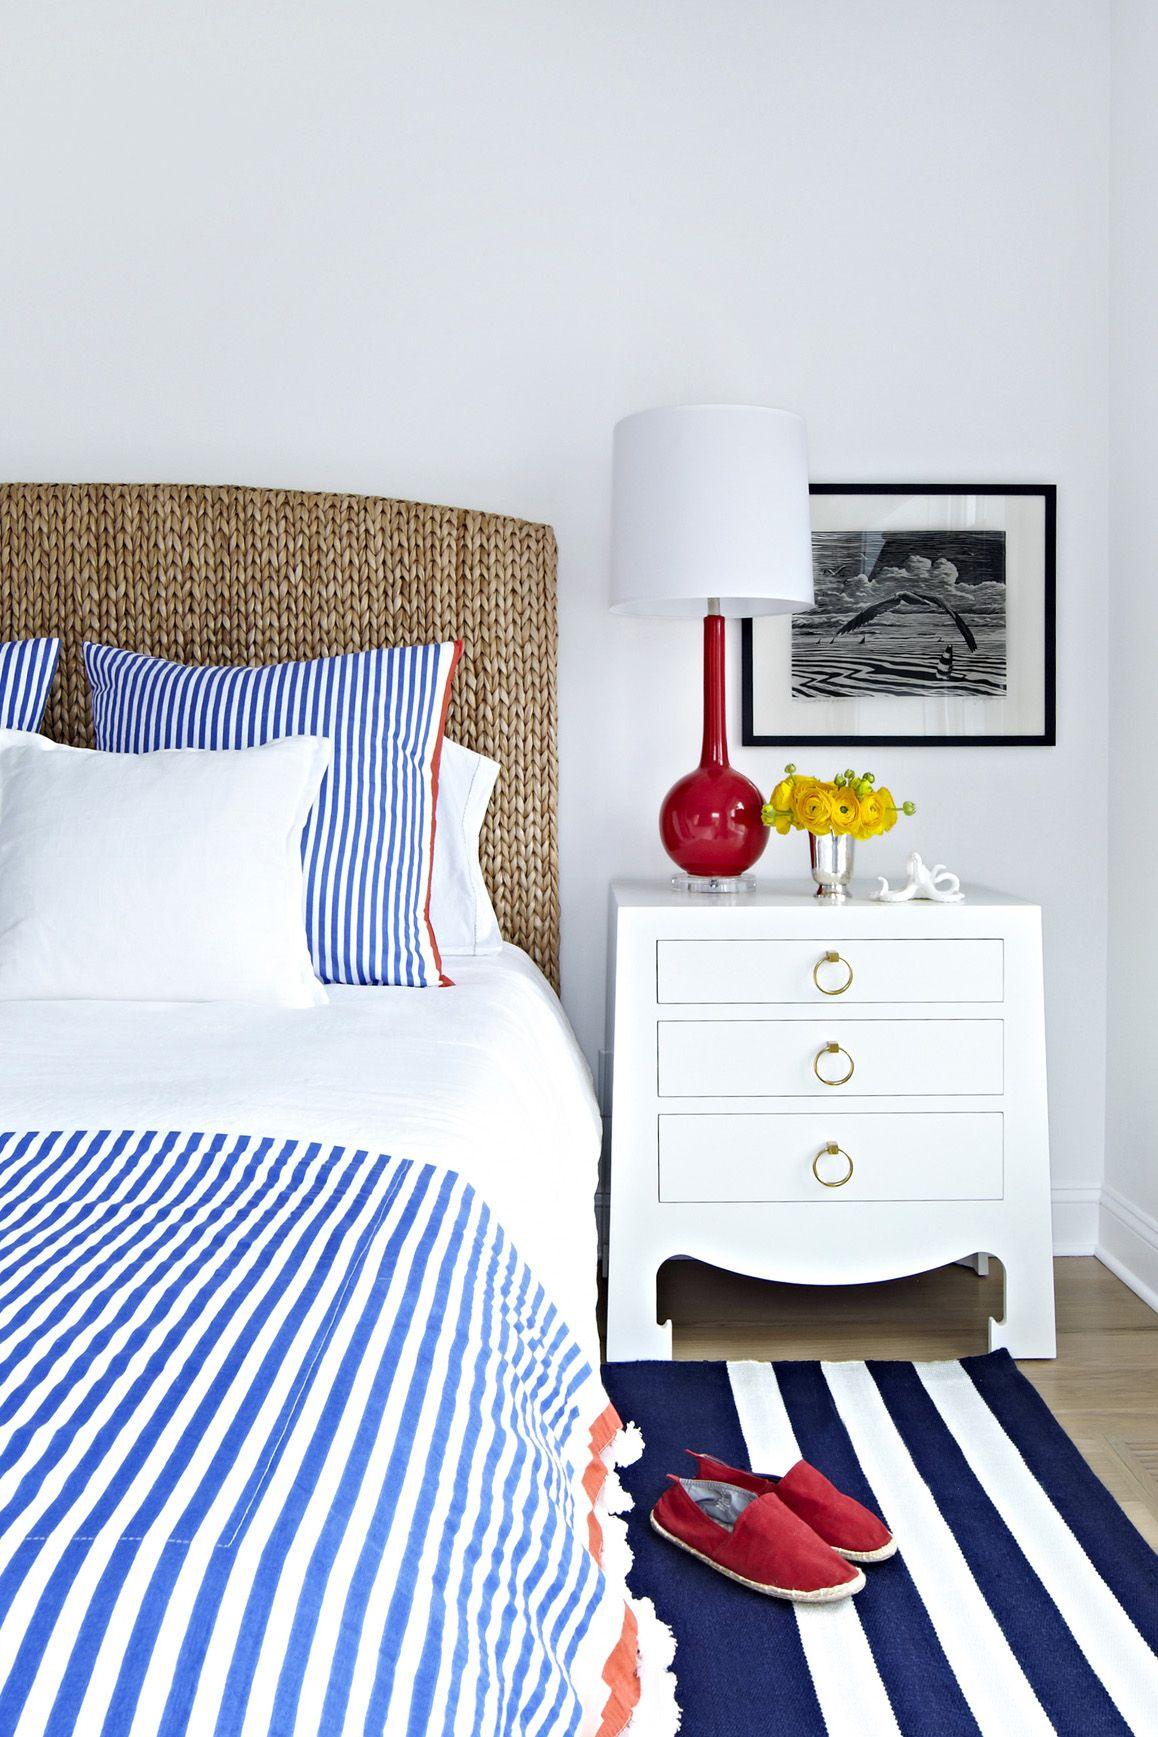 Bedroom furniture ideas Bedroom Decorating Ideas Image Good Housekeeping 65 Bedroom Decorating Ideas How To Design Master Bedroom